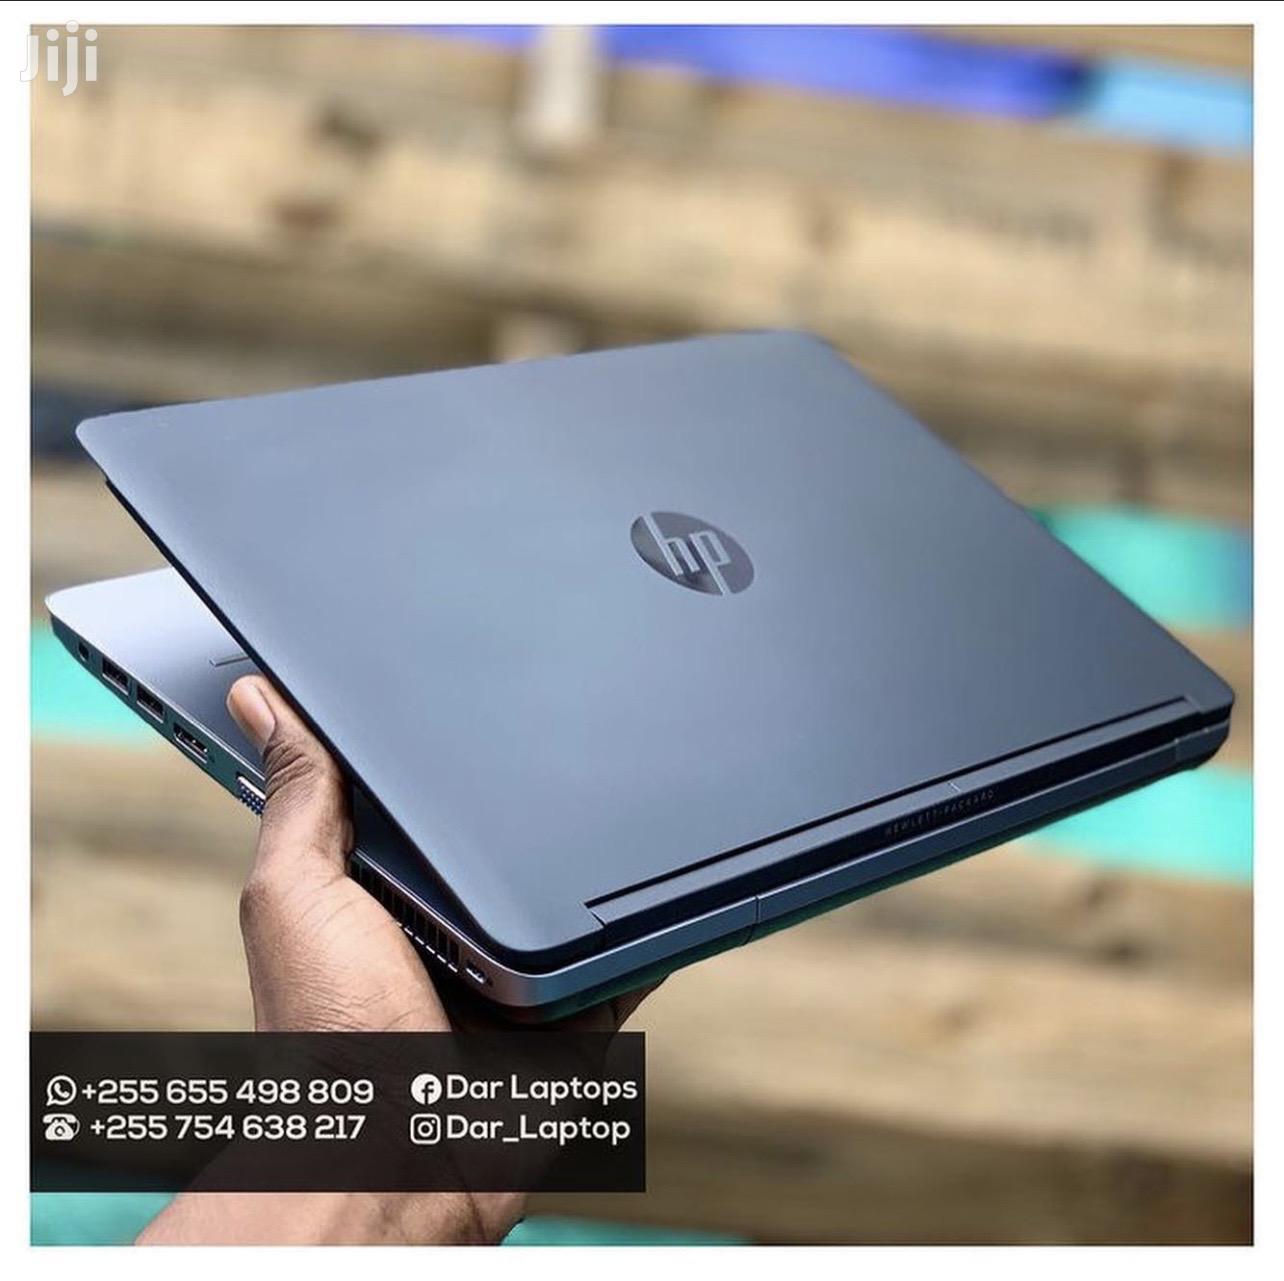 Archive: Laptop HP ProBook 645 G1 6GB AMD A8 HDD 320GB